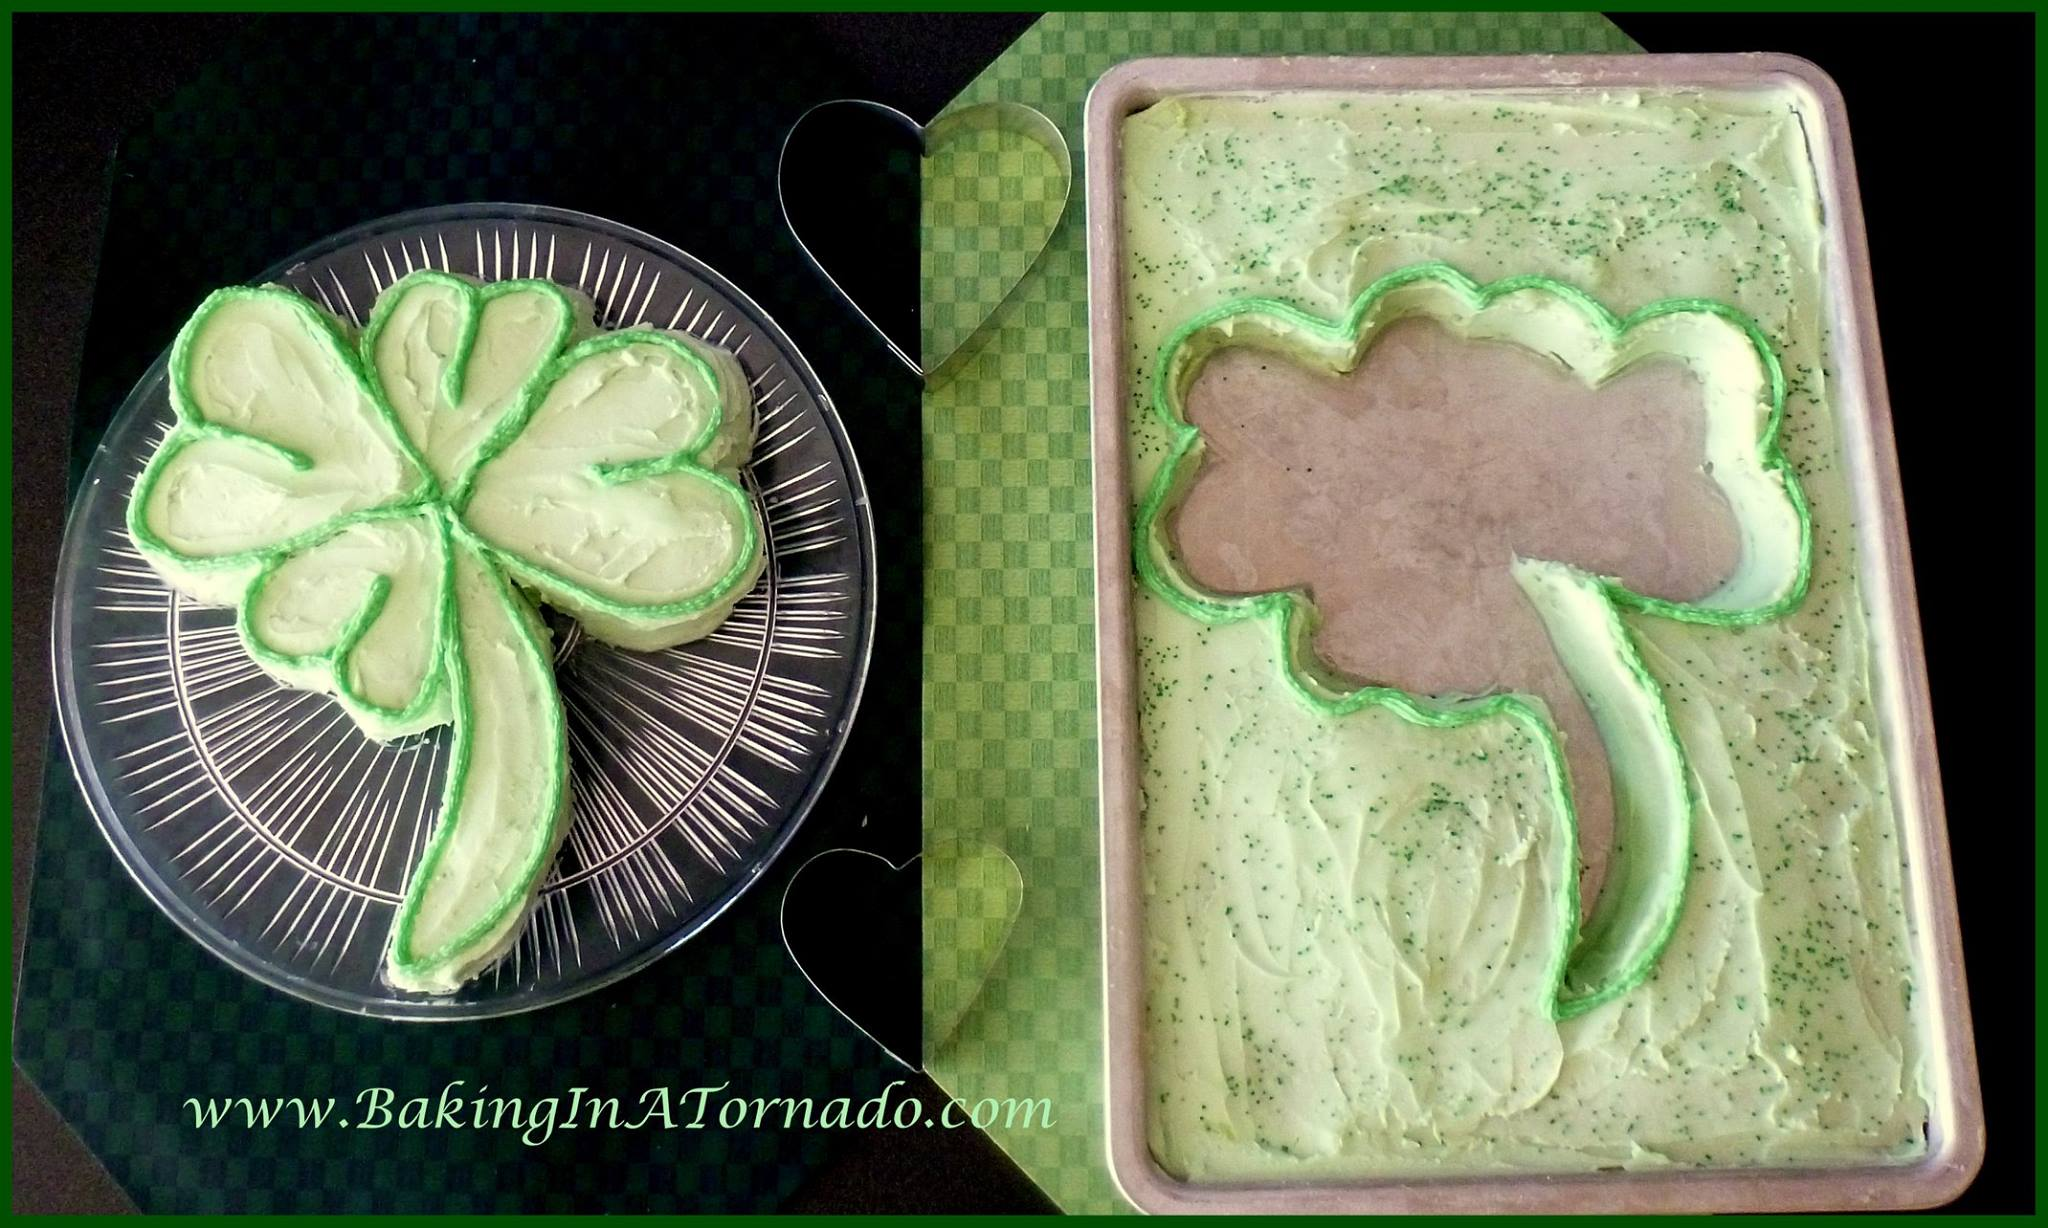 creme de menthe shamrock cake St patricks day